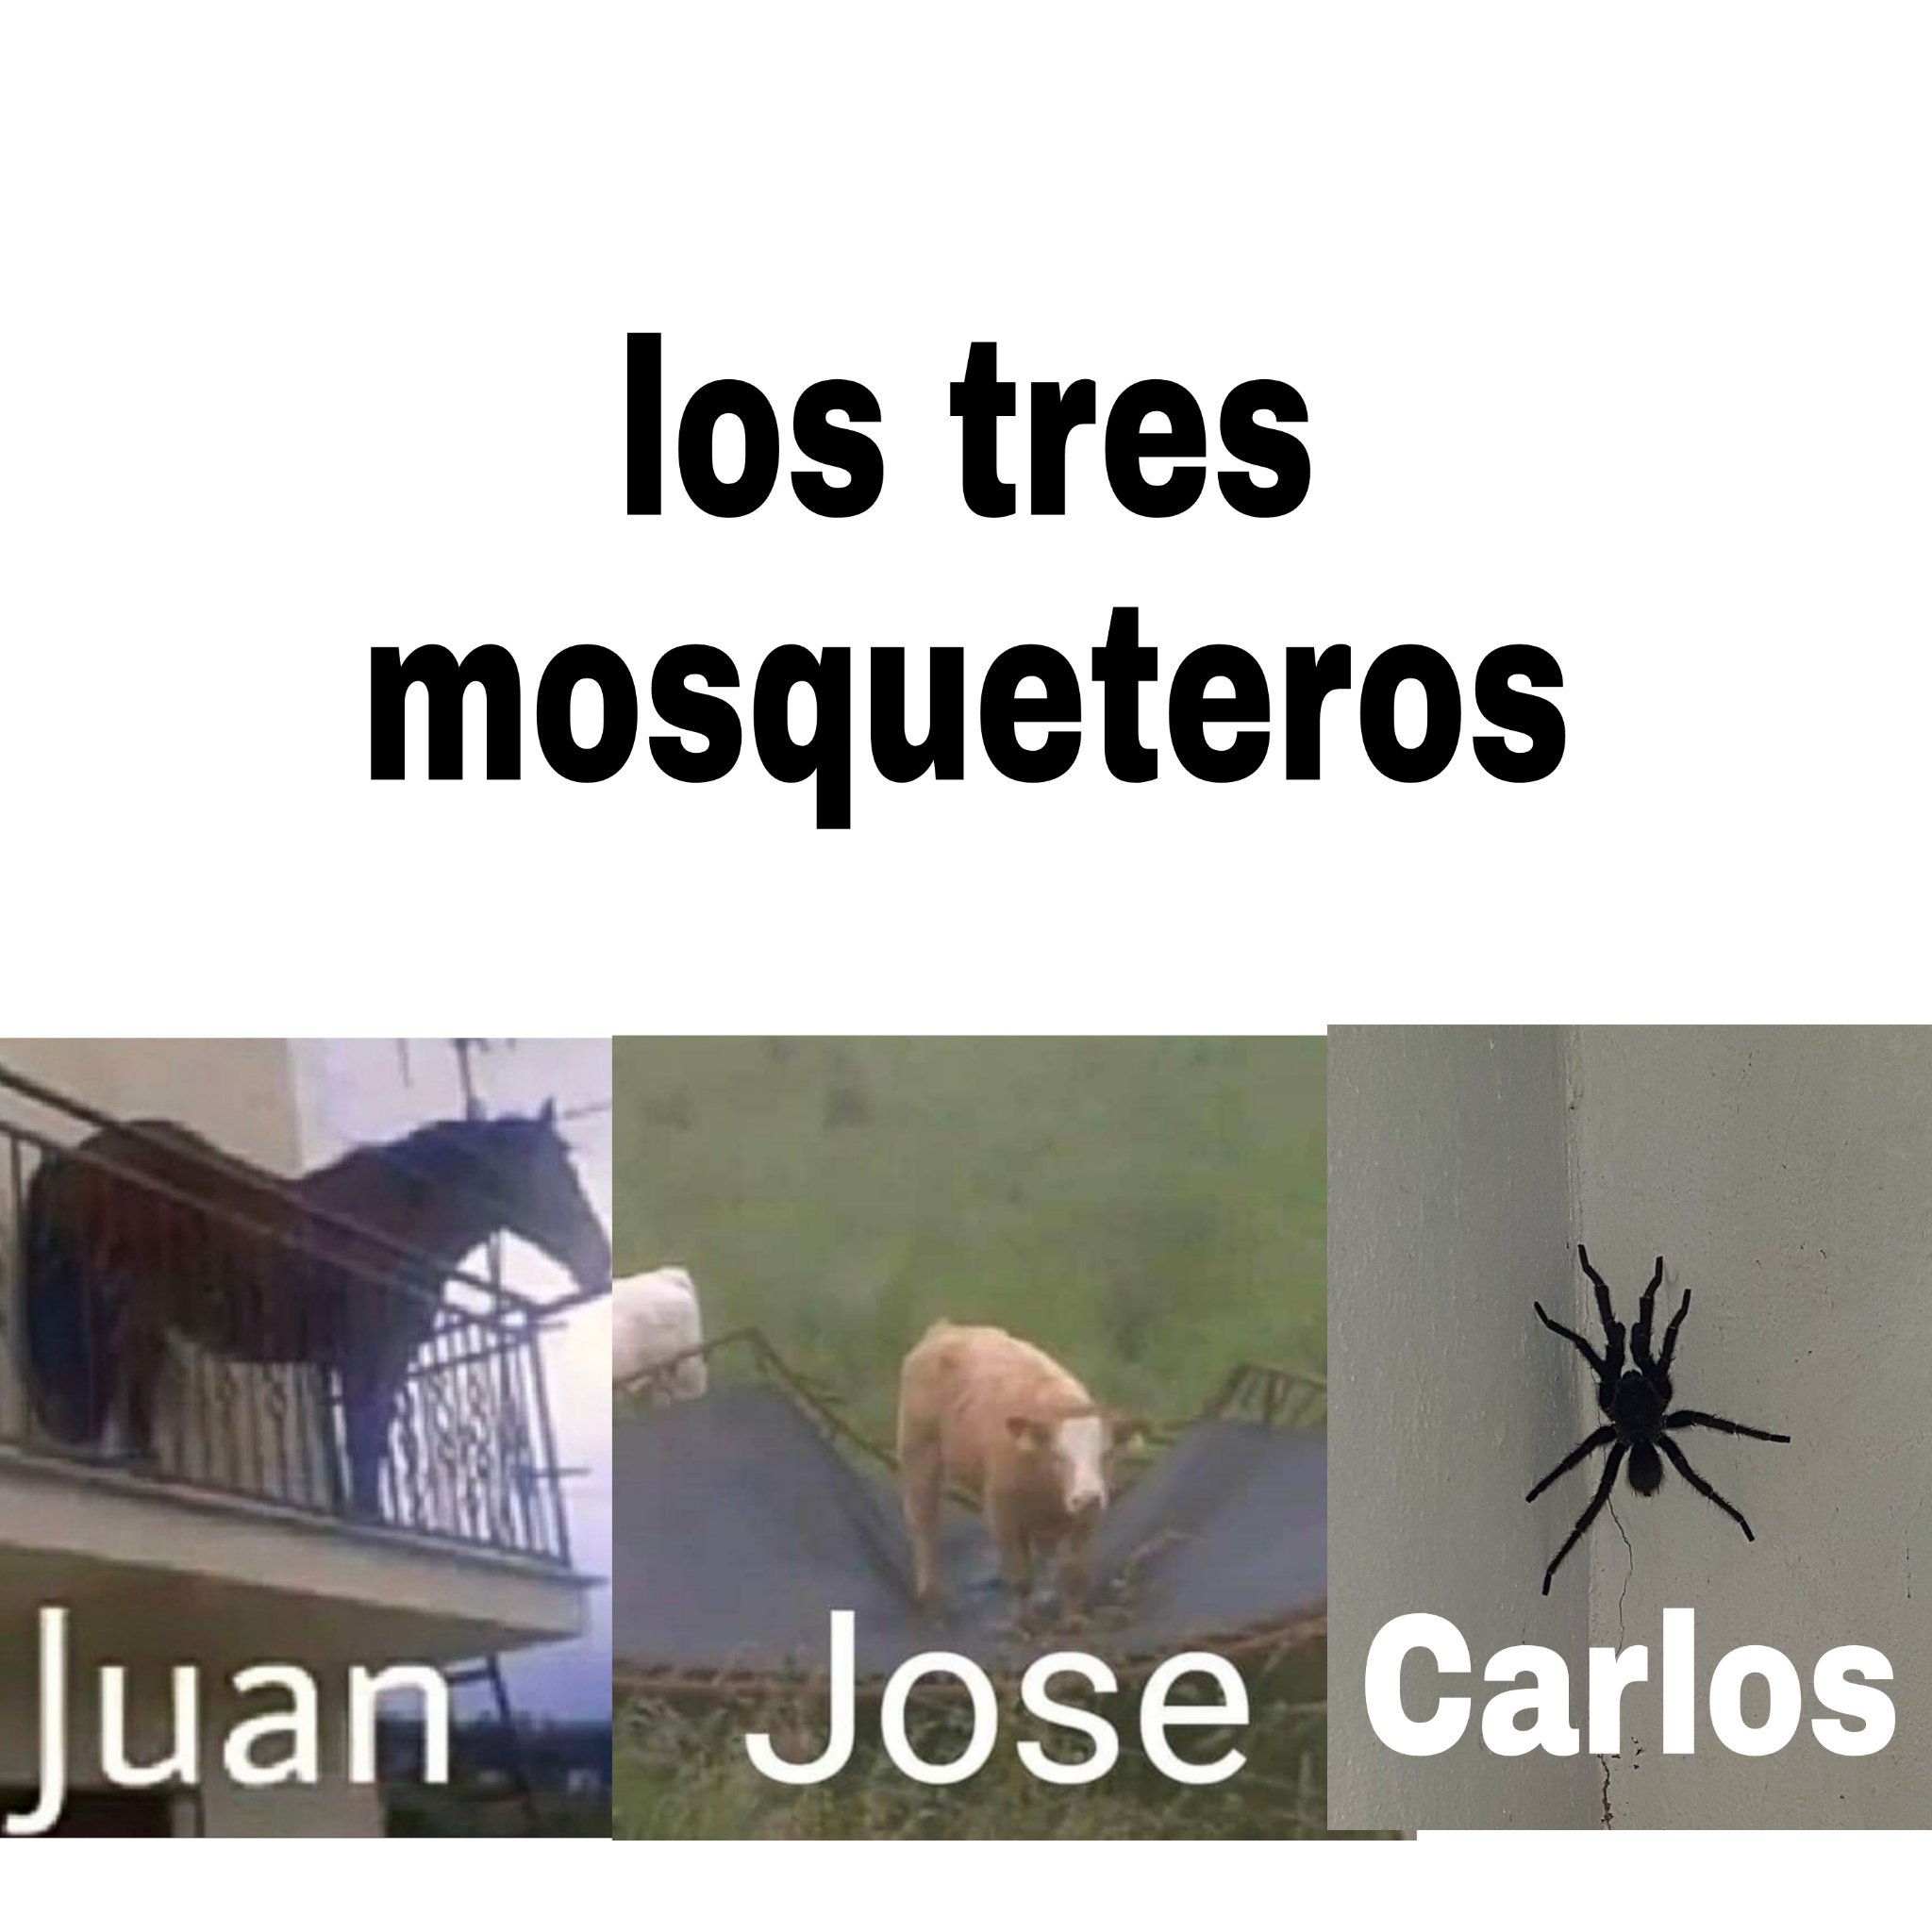 Fusion de animales raros - meme